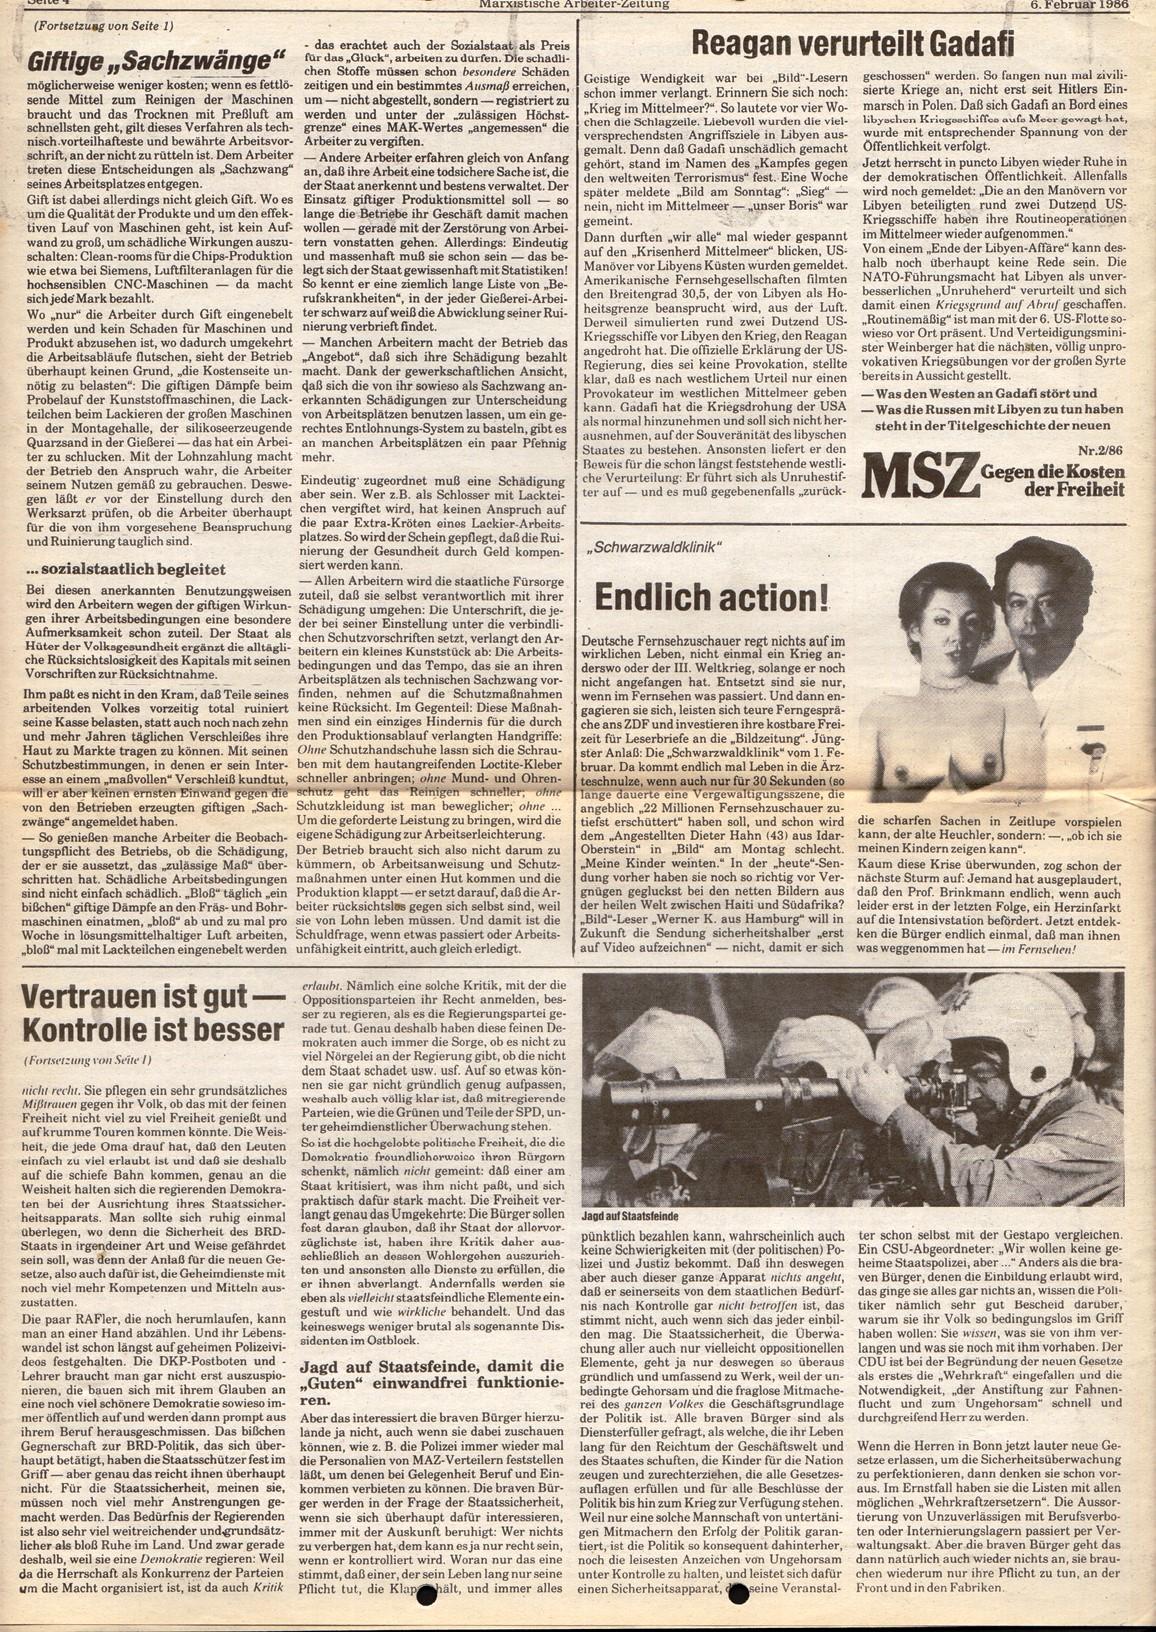 Muenchen_MG_MAZ_Krauss_Maffei_19860206_04